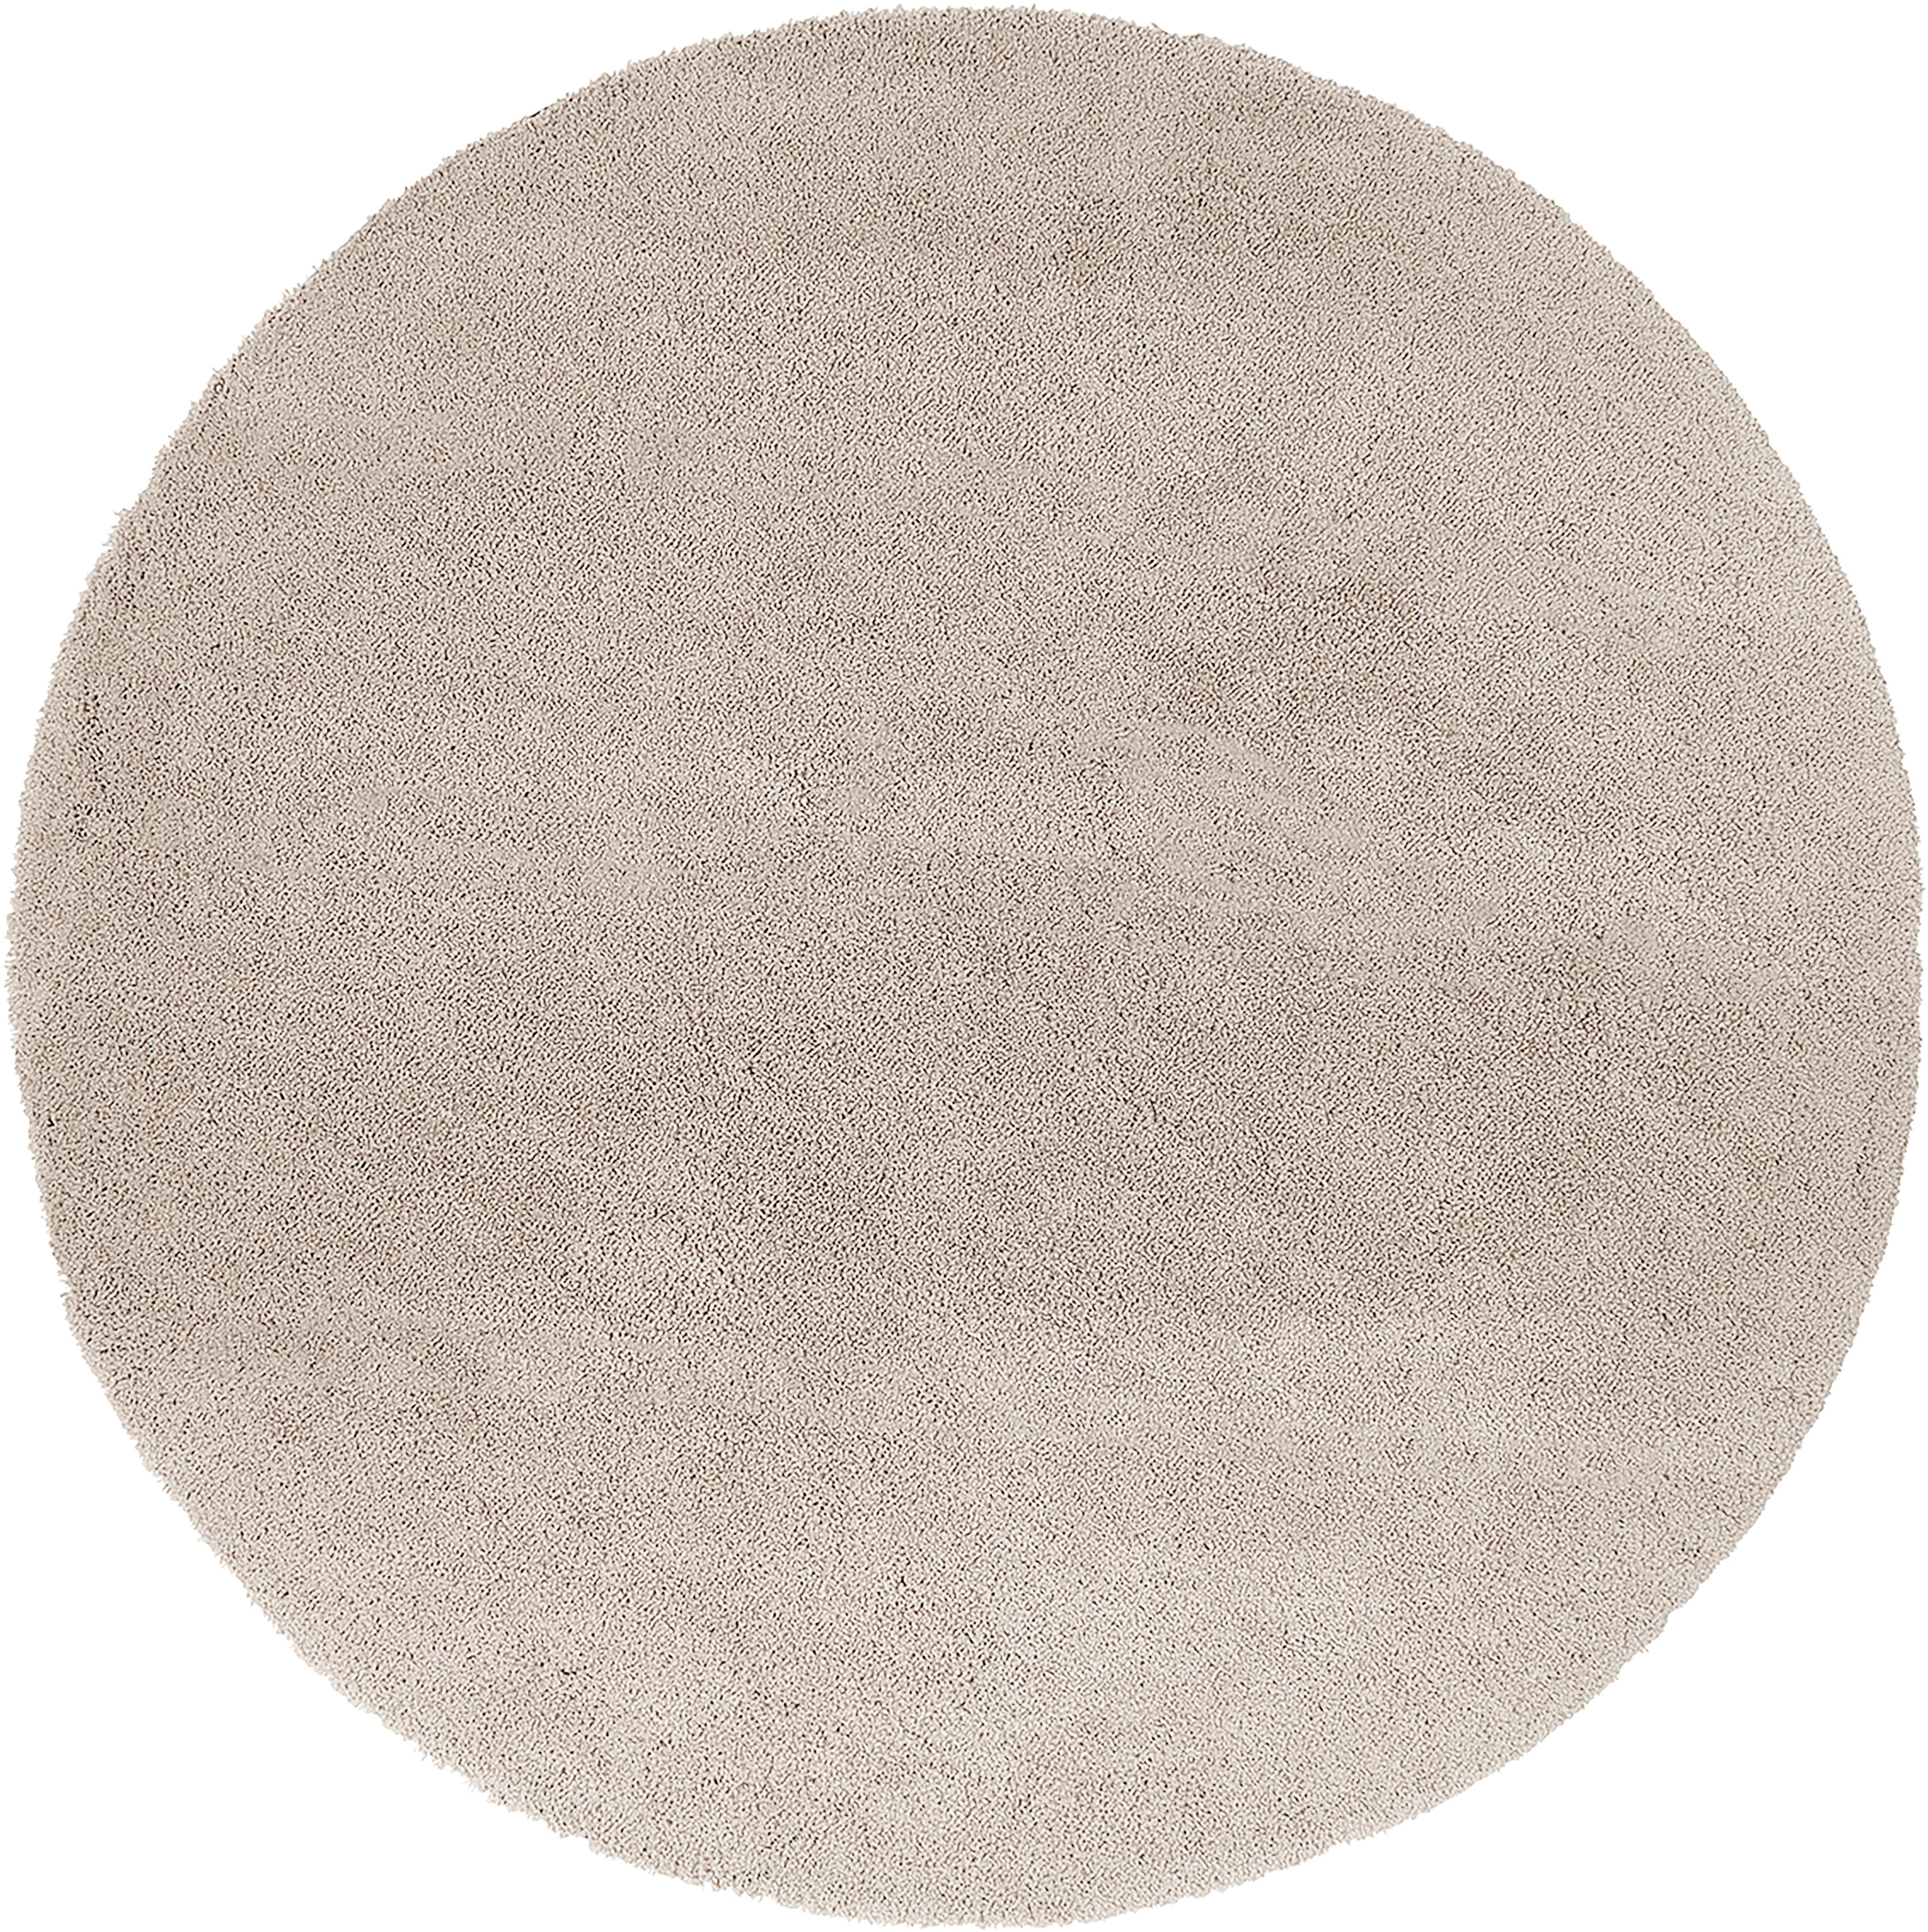 Alfombra redonda de pelo largo Leighton, Parte superior: 100%poliéster (microfibr, Reverso: 70%poliéster, 30%algodó, Beige, Ø 200 cm (Tamaño L)